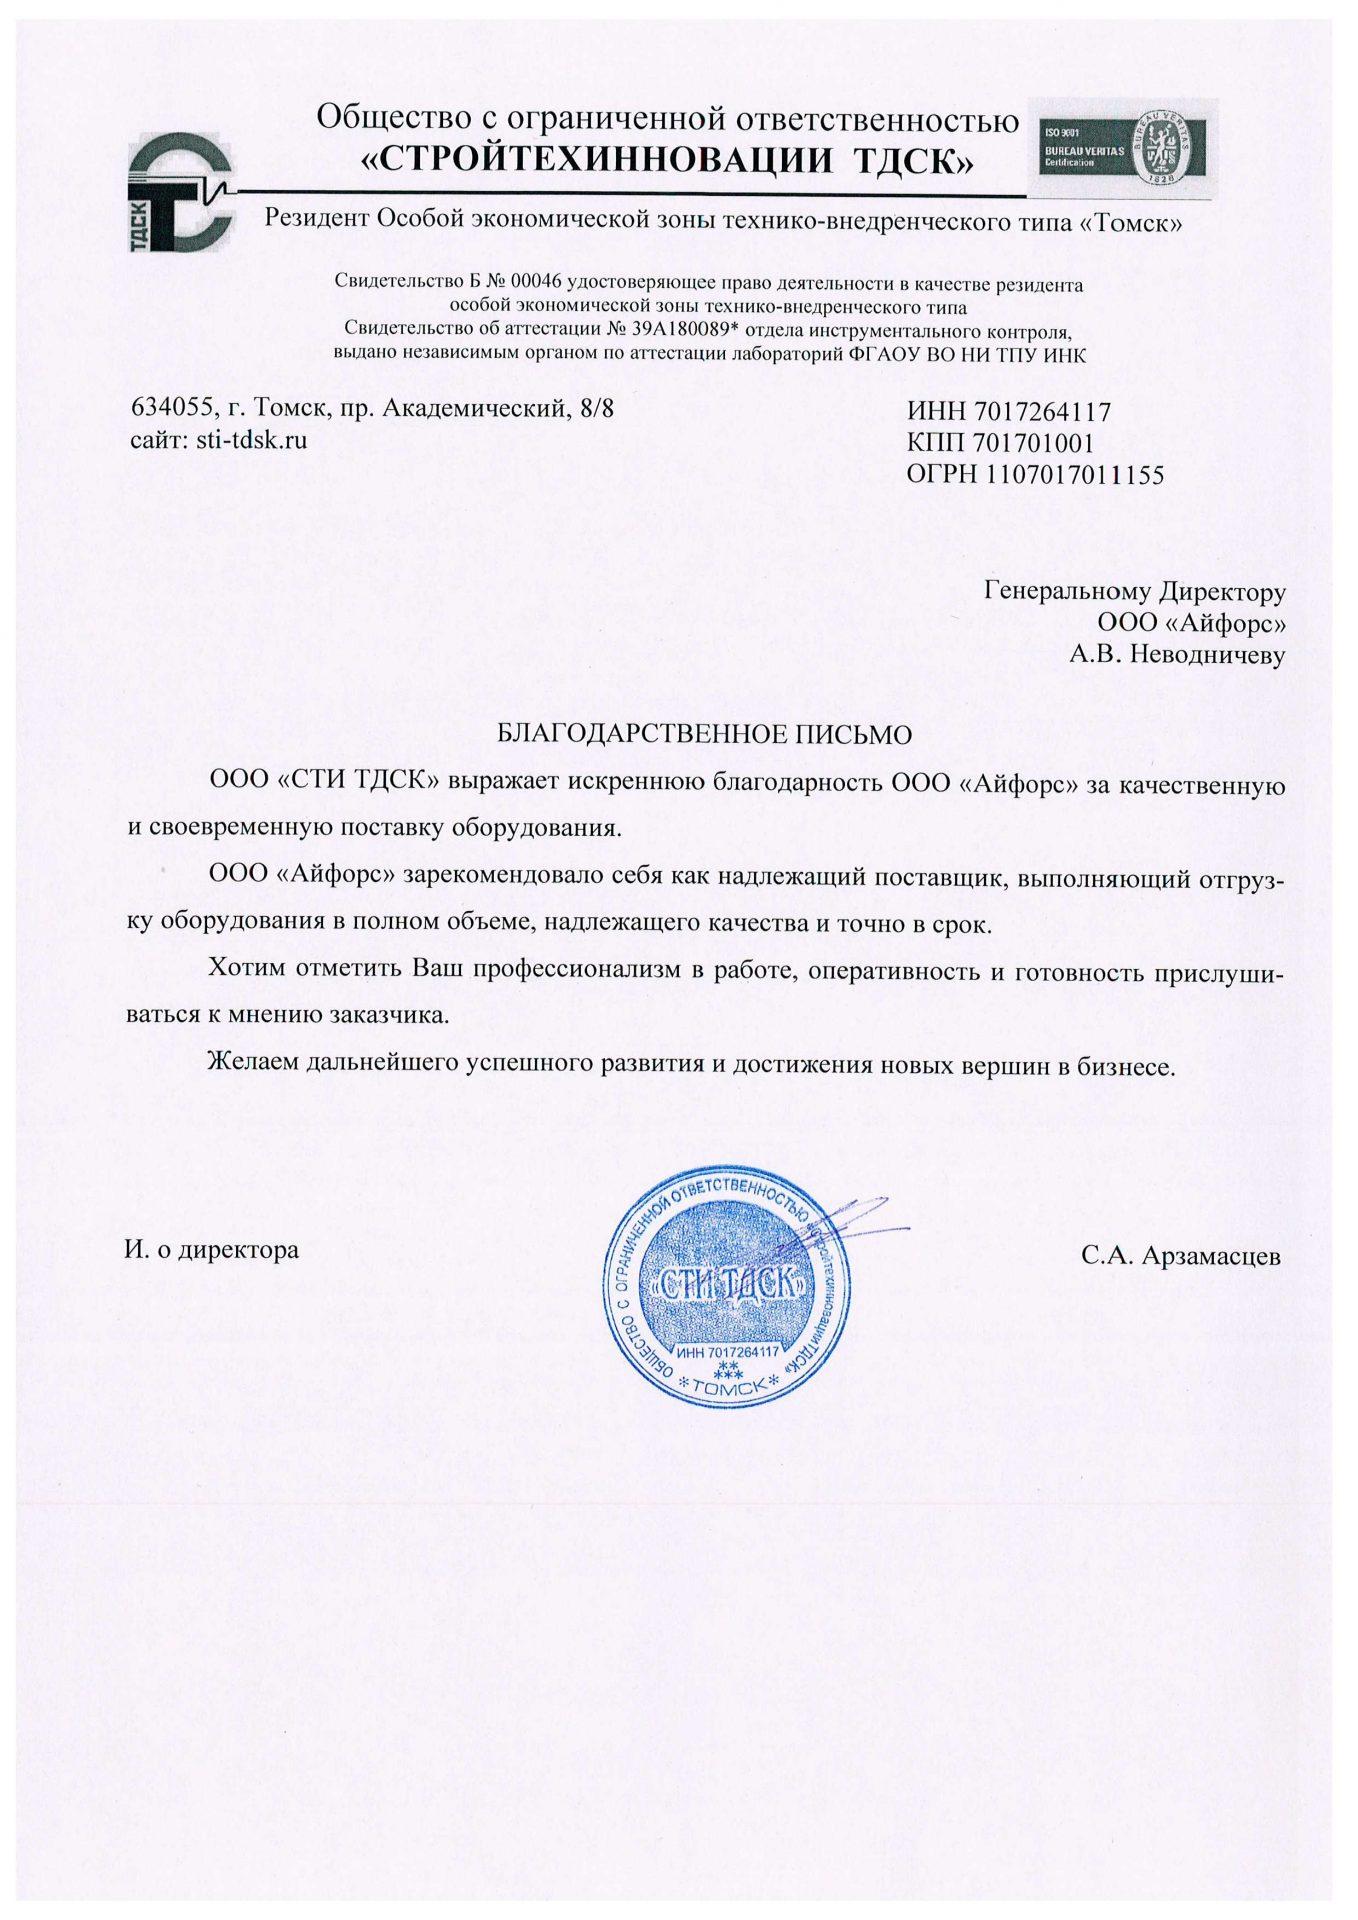 С. А. Арзамасцев